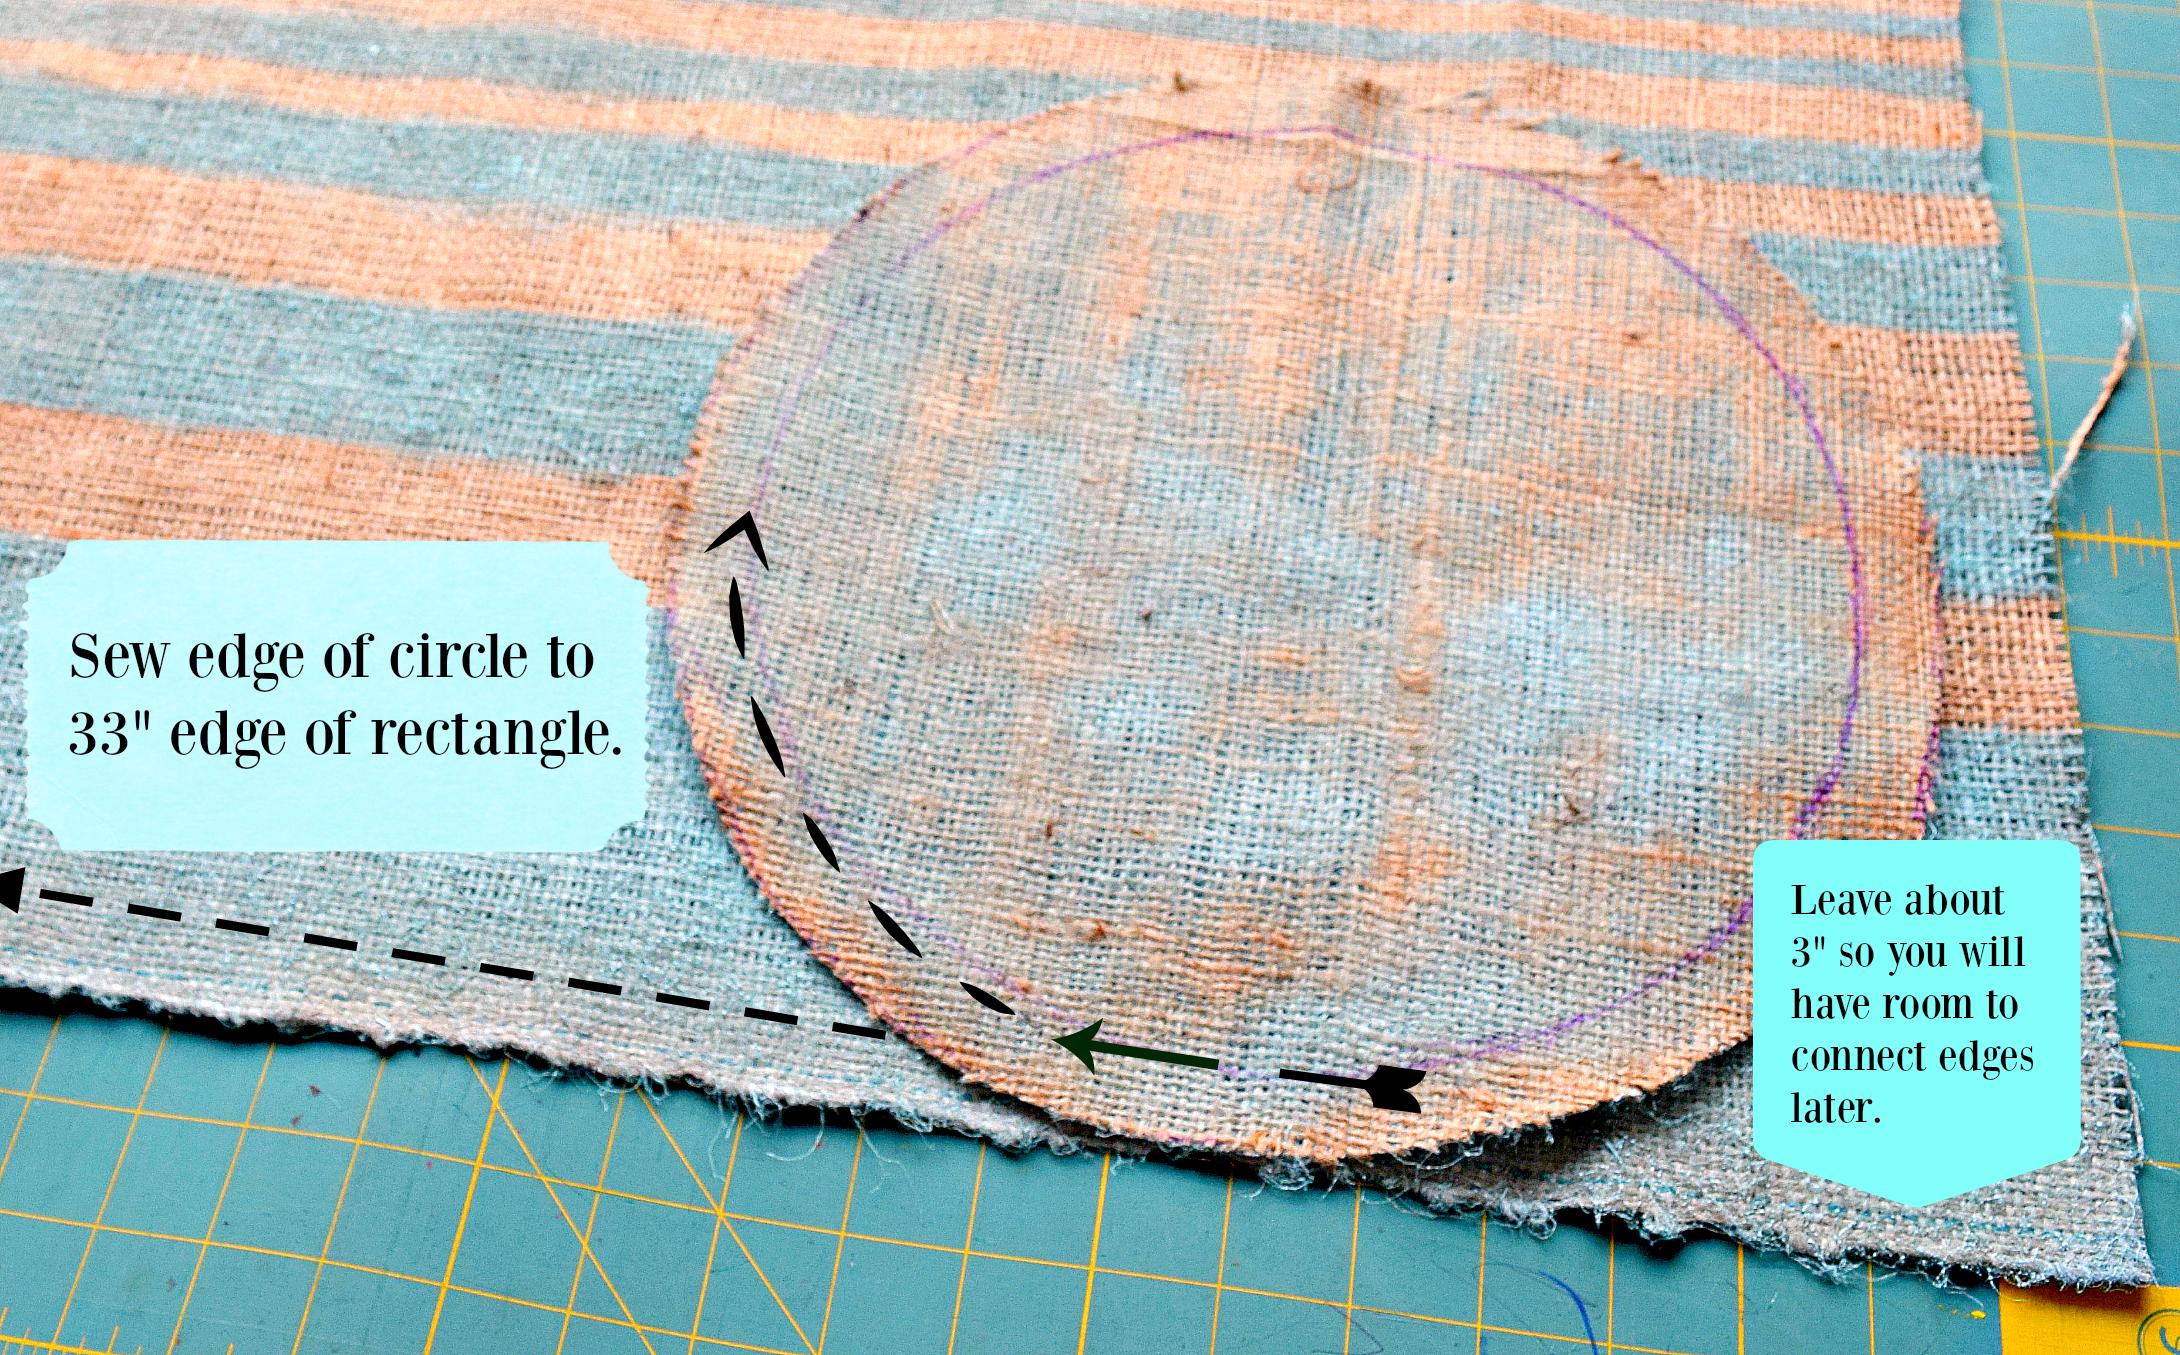 planter tutorial sewing edges